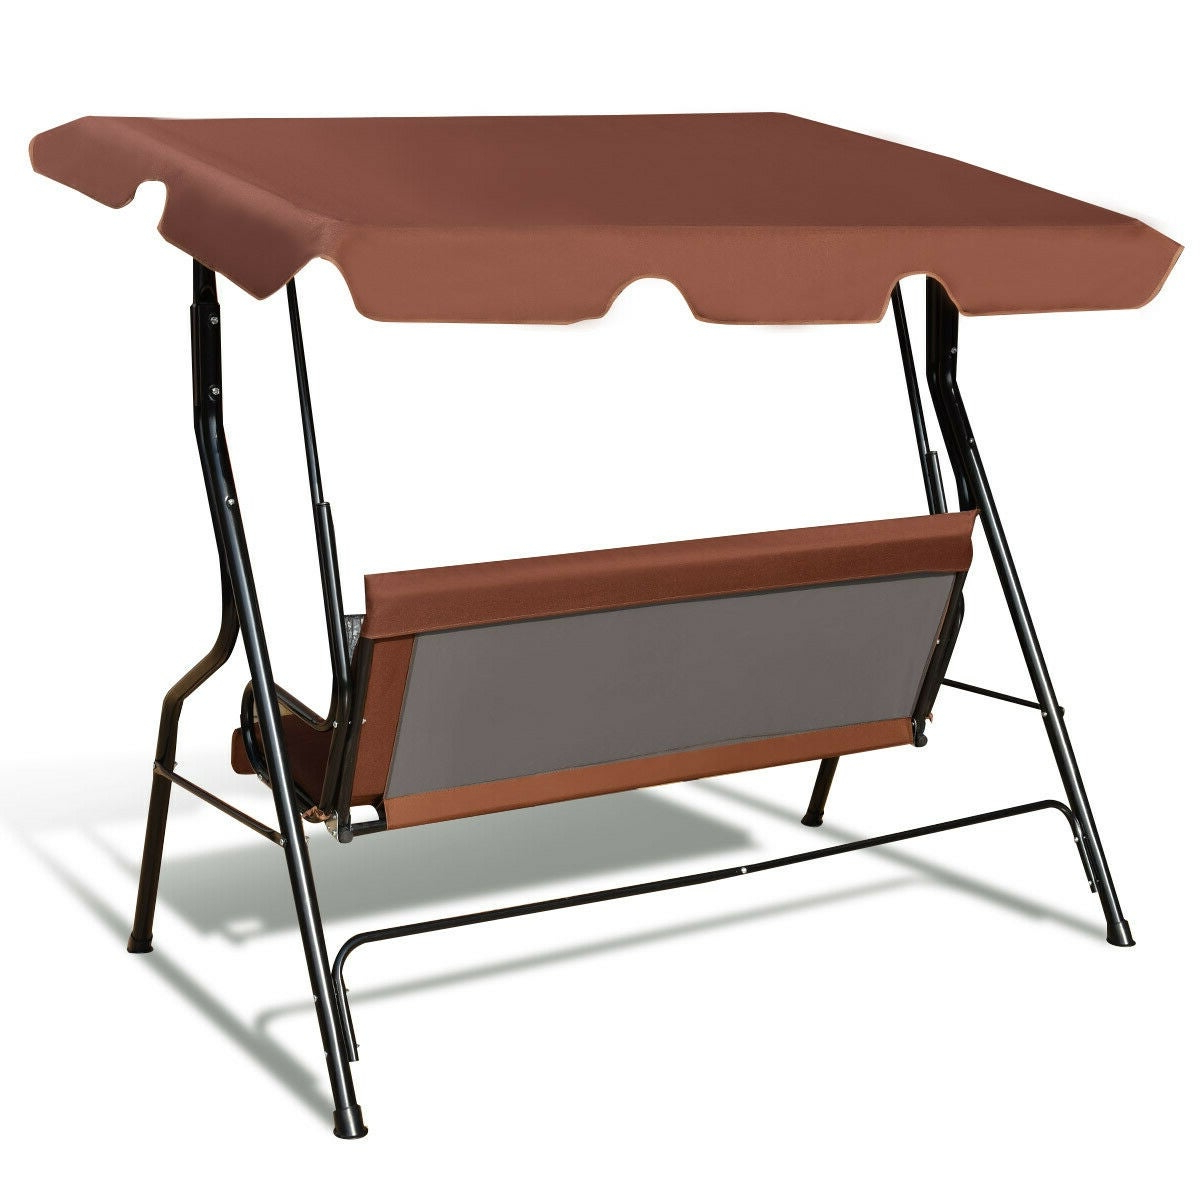 3 Seats Patio Canopy Swing Gliders Hammock Cushioned Steel Frame In Popular Costway 3 Seats Patio Canopy Swing Glider Hammock Cushioned Steel Frame  Backyar Coffee (View 4 of 30)